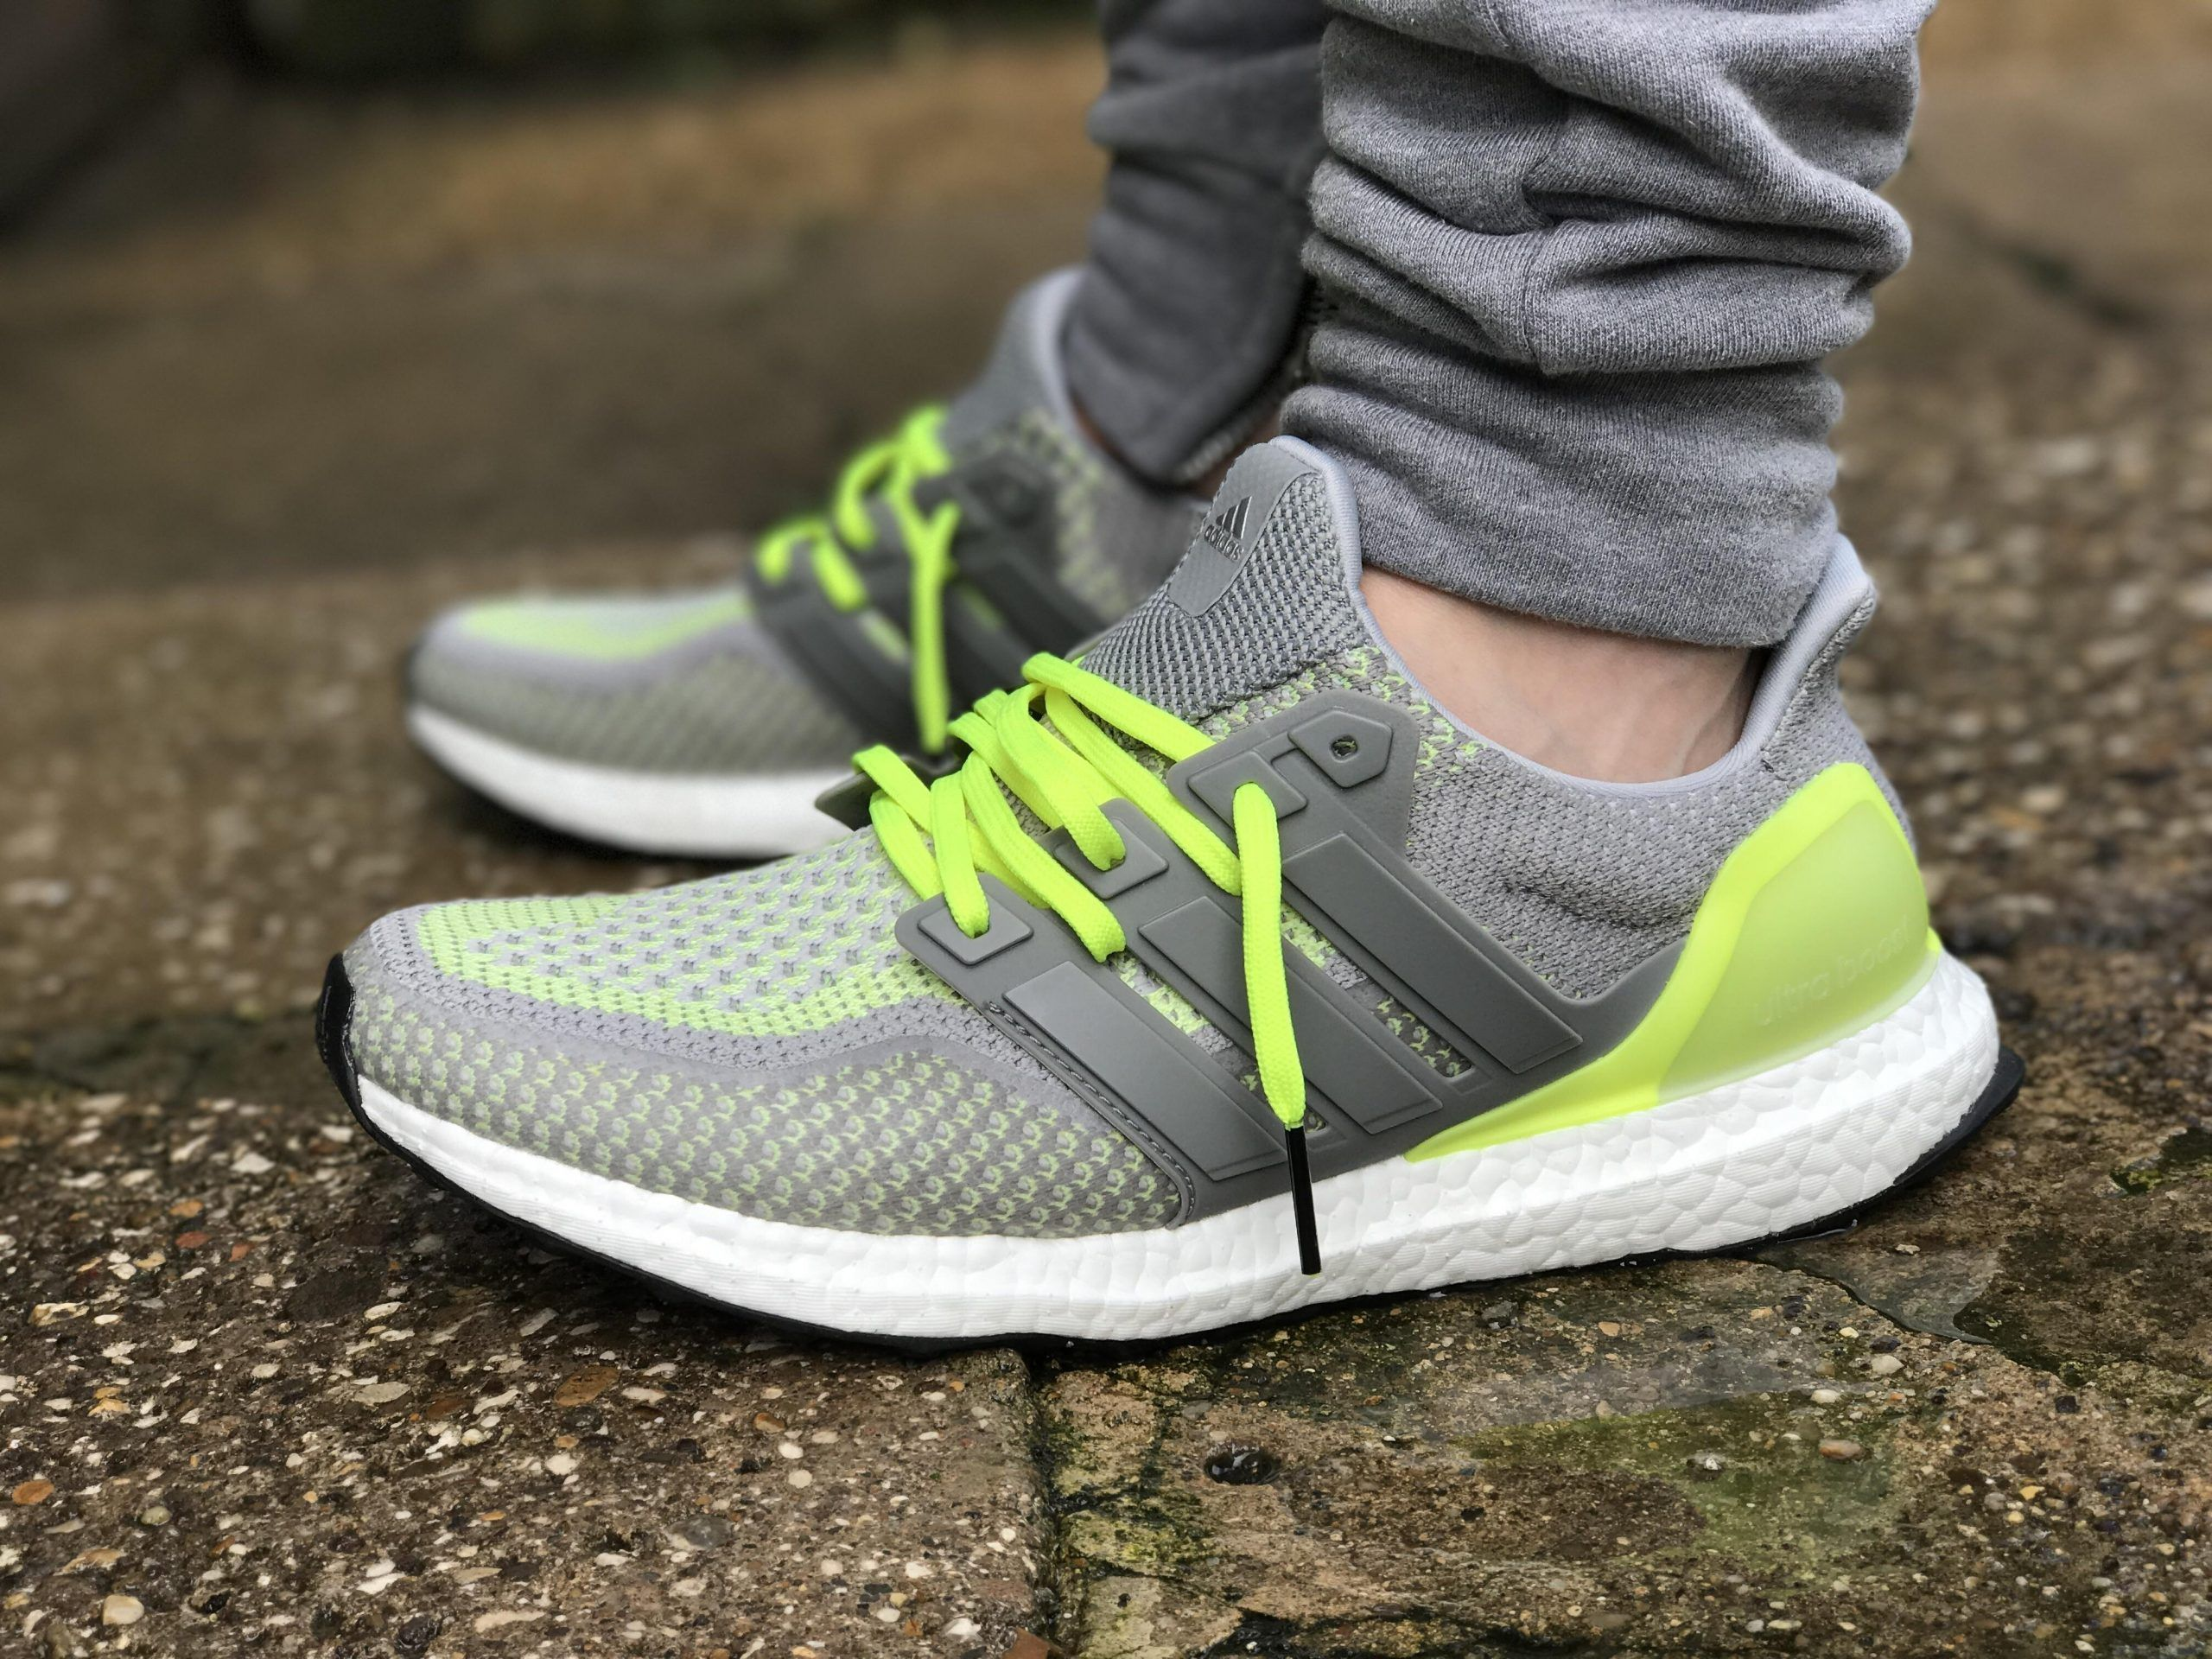 adidas boost glow